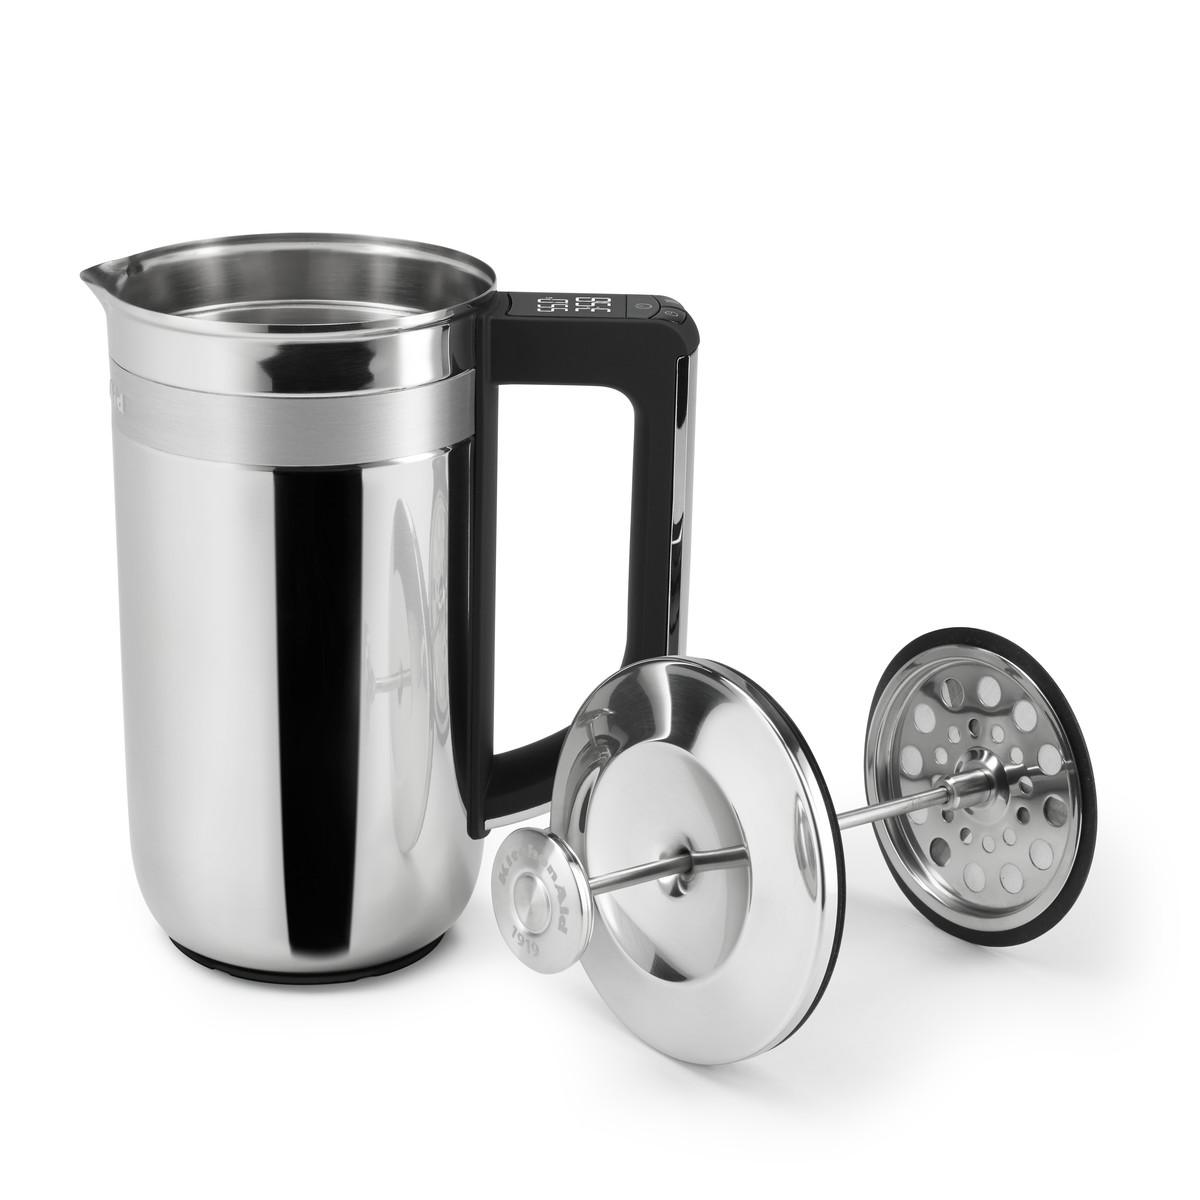 "KitchenAid Kaffeezubereiter ""Artisan"" Präzisions-Presse 5KCM0512ESS"